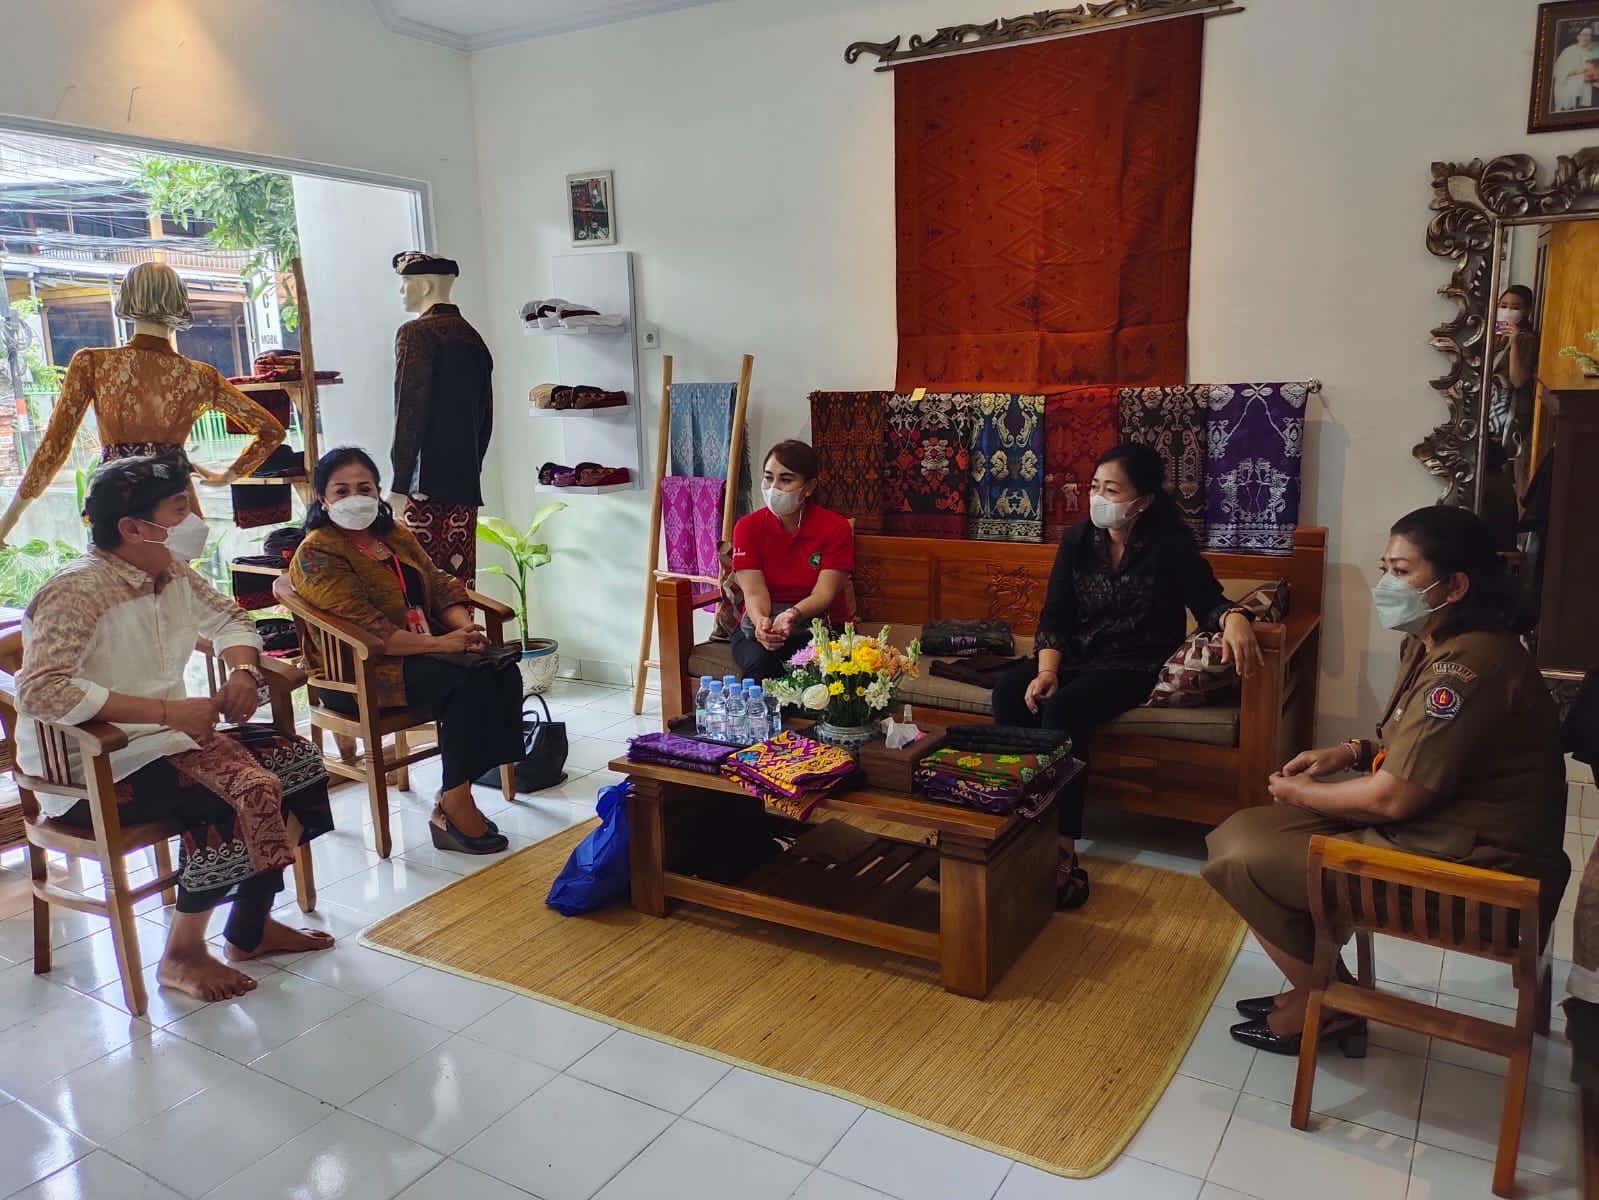 KETUA Dekranasda Kota Denpasar, Sagung Antari Jaya Negara, bersama Ayu Kristi Arya Wibawa saat meninjau Rumah Belanja Denpasar. Foto: ist